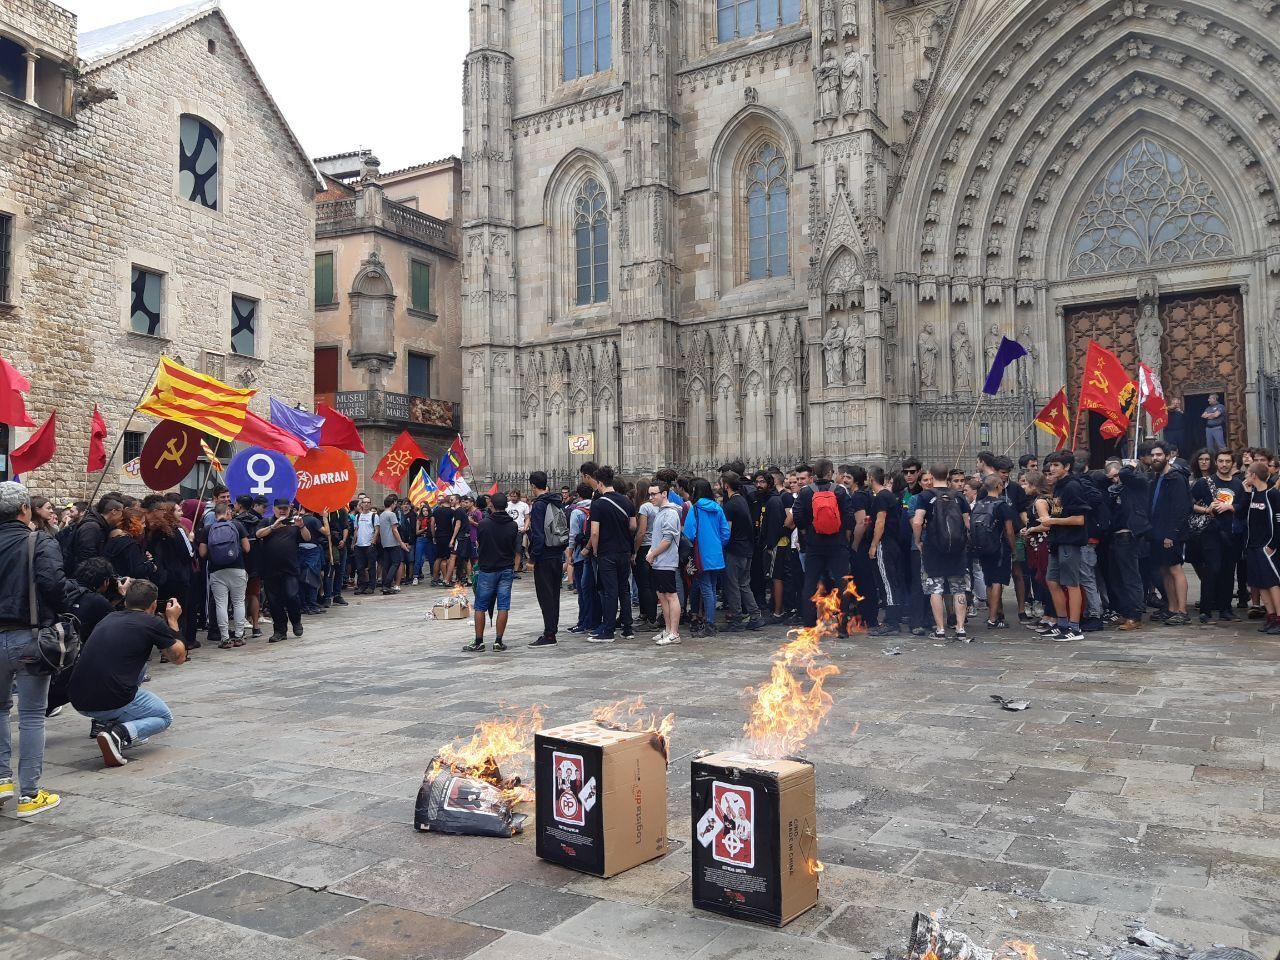 Empieza el vandalismo en la Diada: queman fotos del rey e intentan asaltar el 'Parlament'